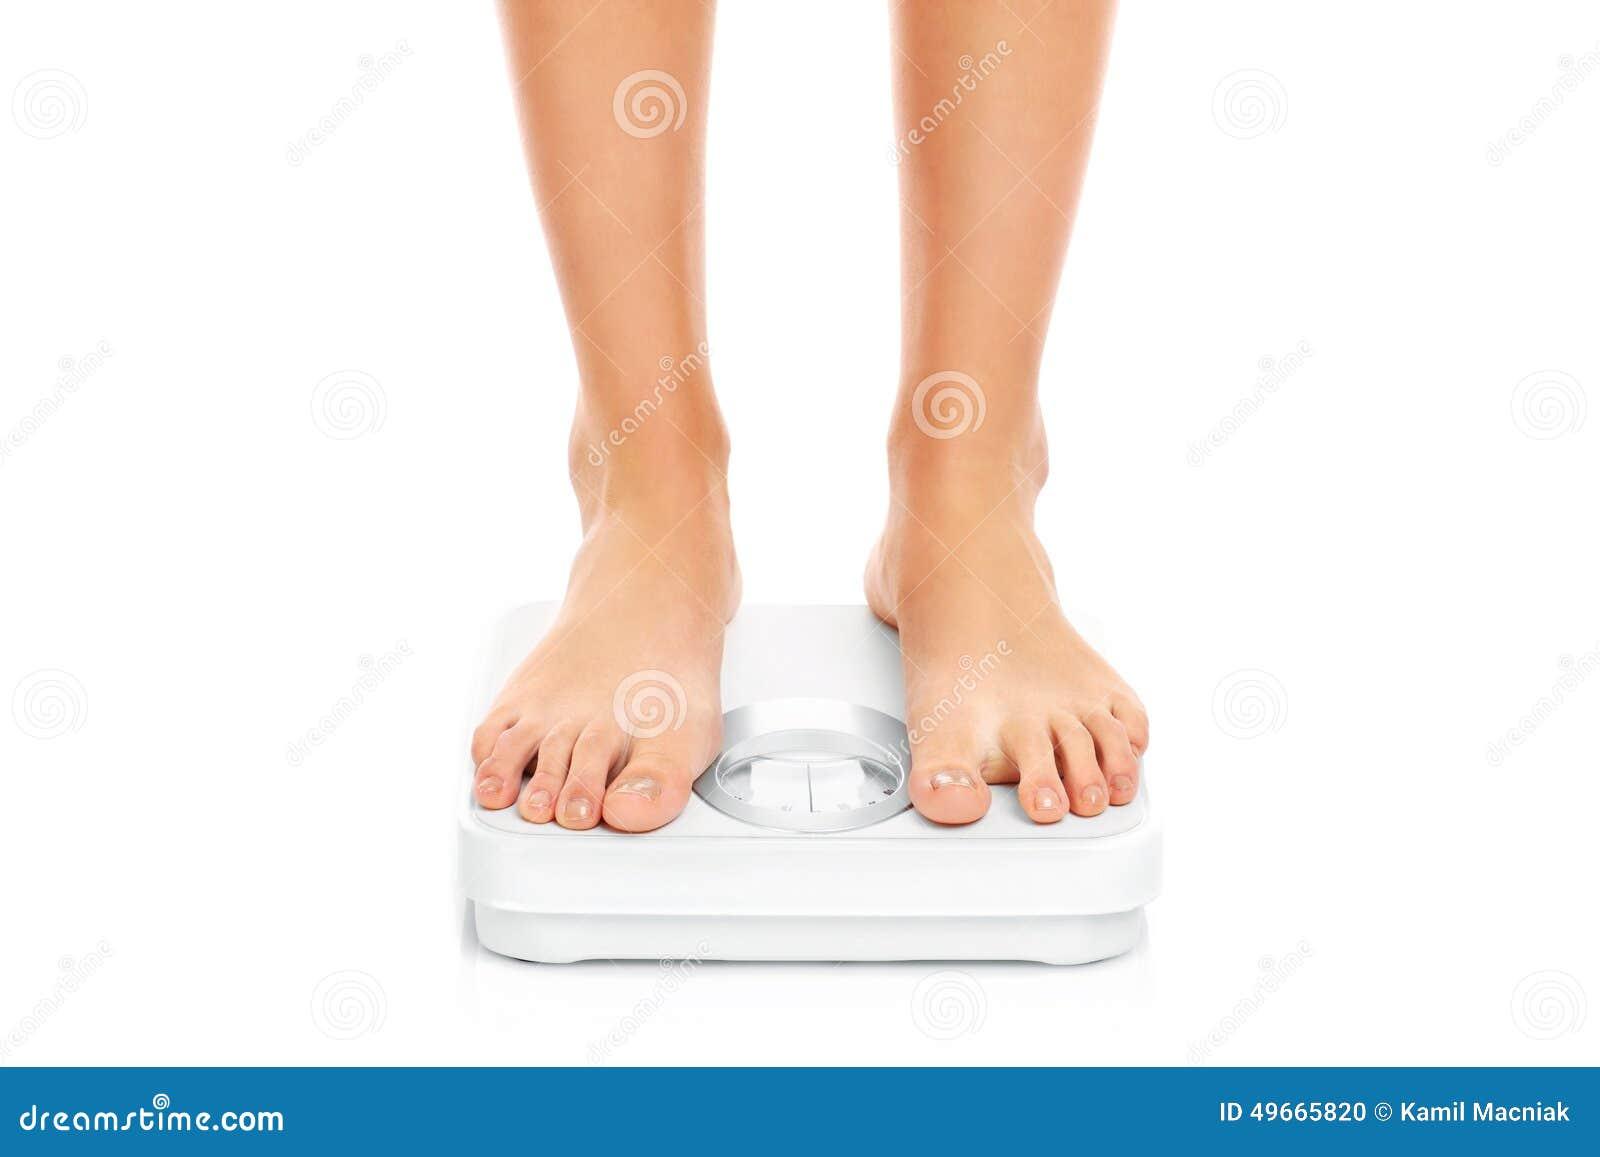 Woman Feet On Bathroom Scales Stock Photo